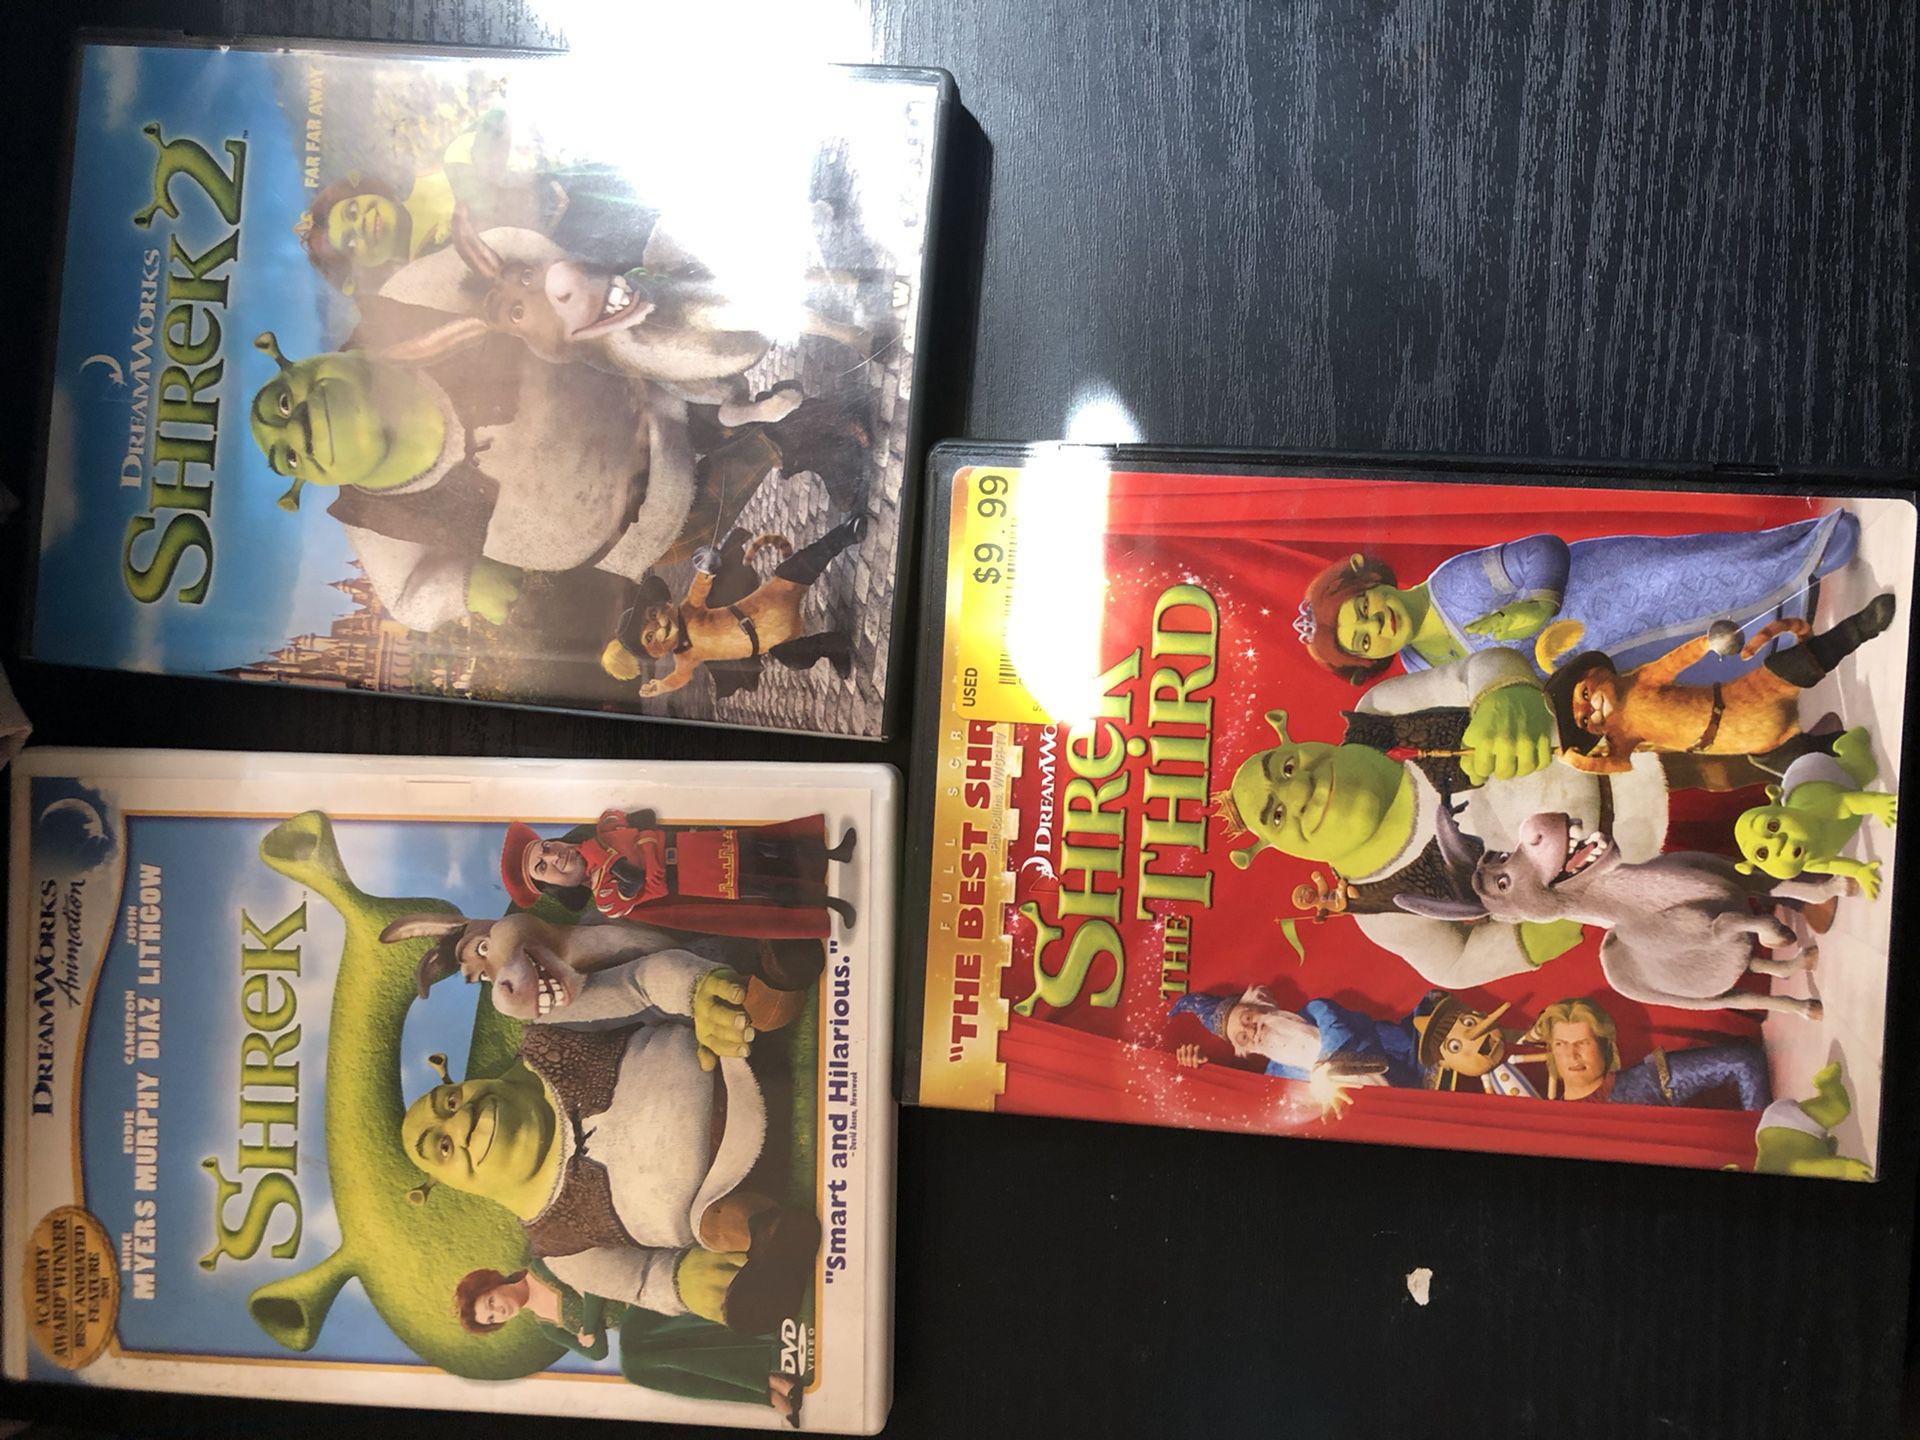 Shrek 1-3  Bundle Deal